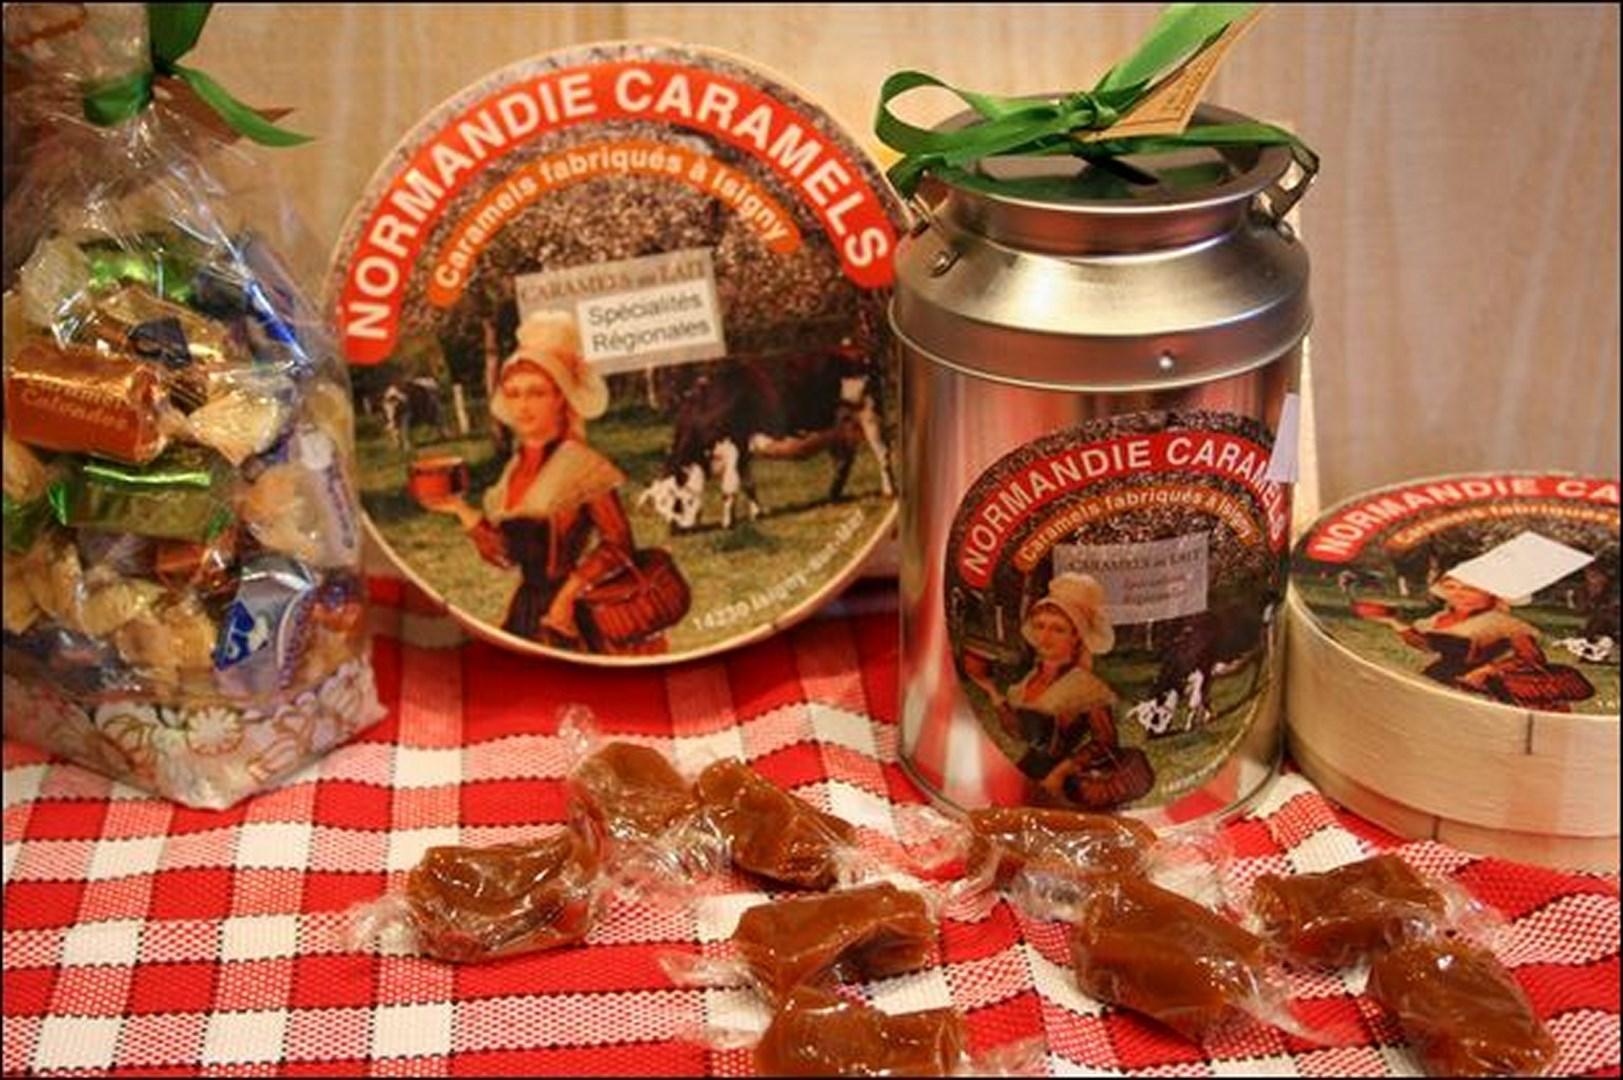 Camembert, caramels...